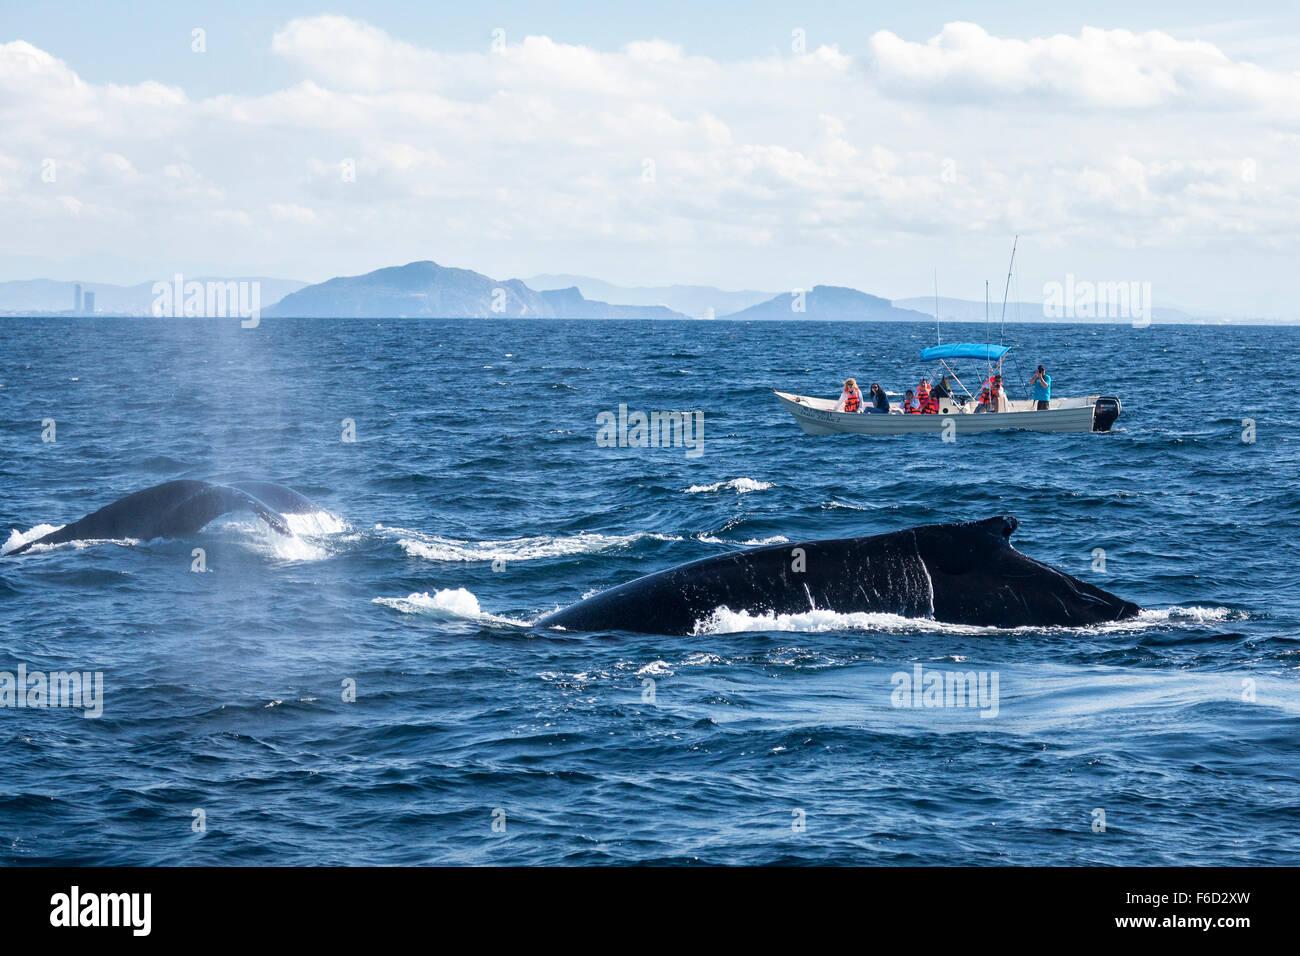 A boat of tourists observe humpback whales off the coast of Mazatlan, Sinaloa, Mexico. - Stock Image